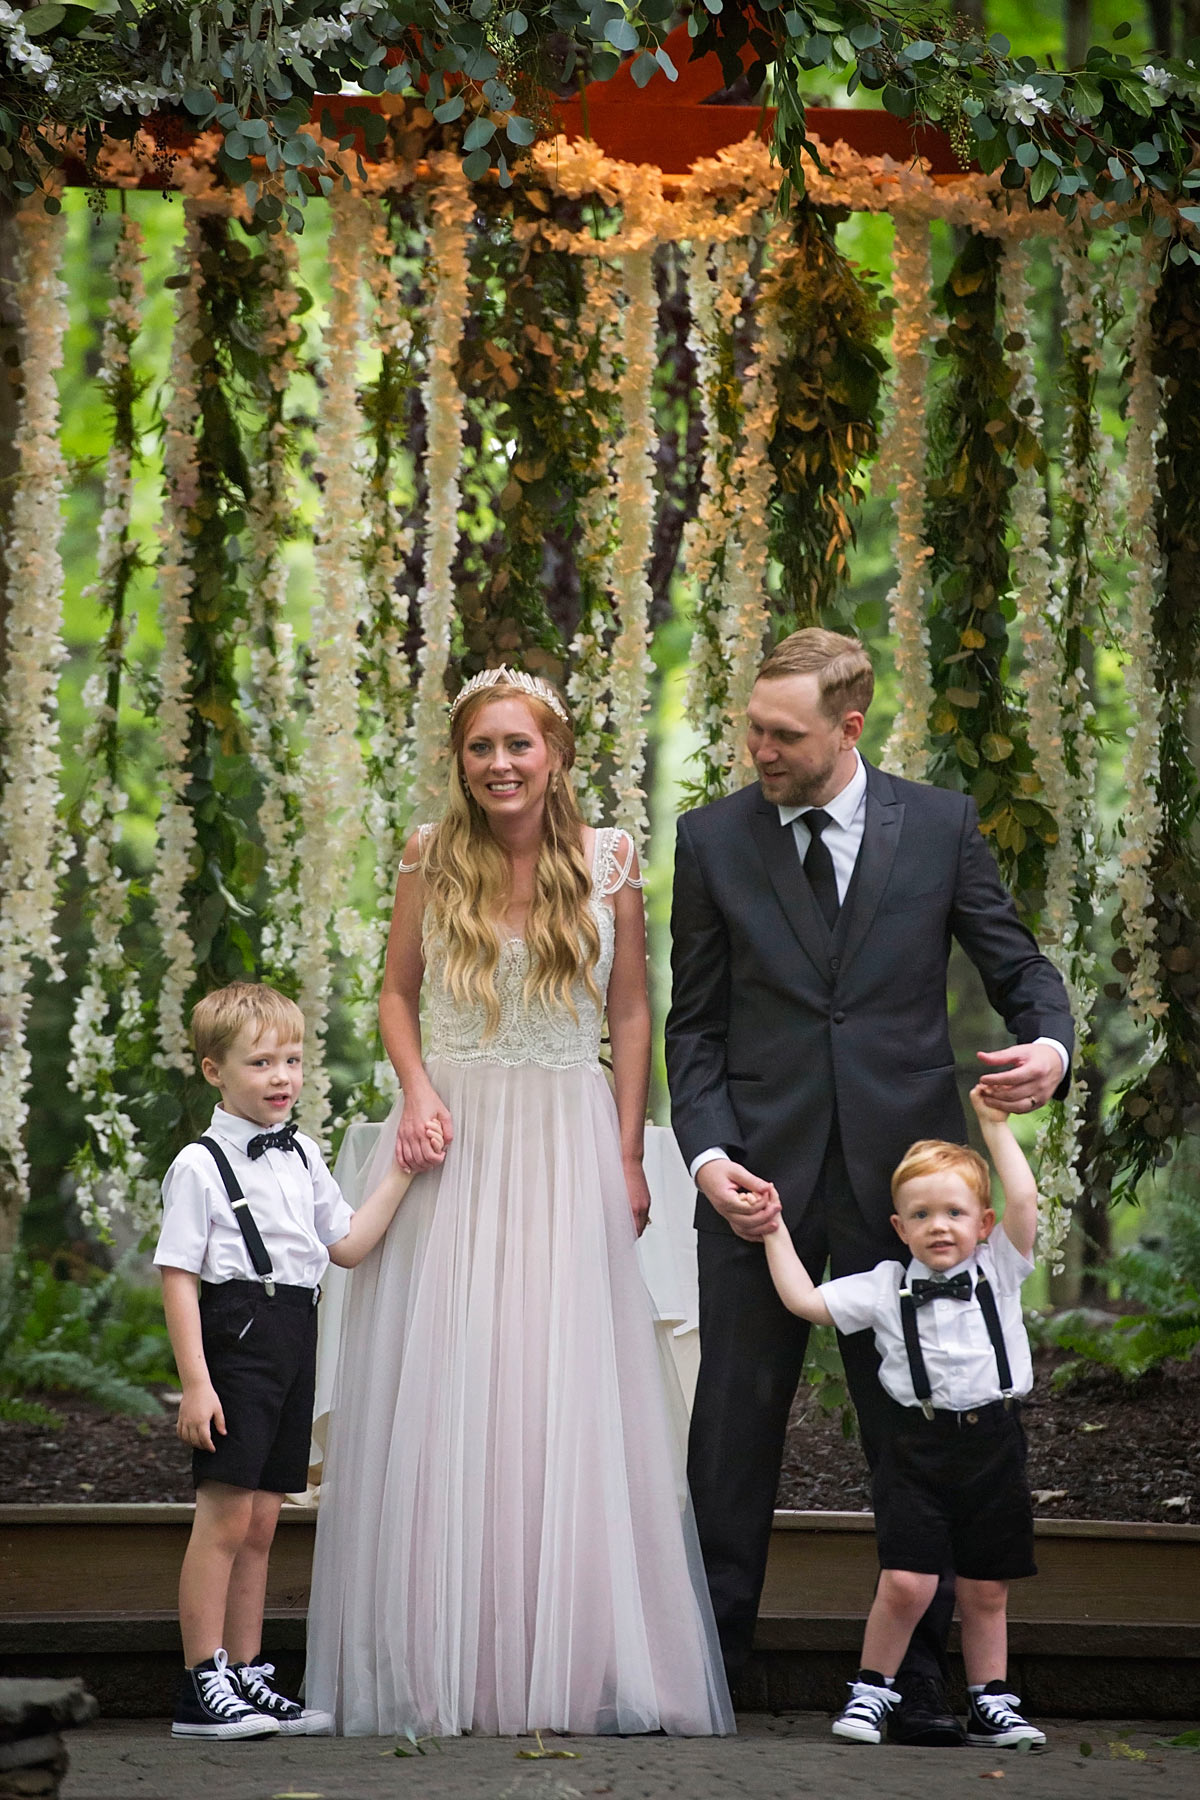 Bucks_County_wedding_photographer_Stroudsmoor_country_inn_wedding_Philadelphia_wedding_photographer_20_flower_backdrop.JPG